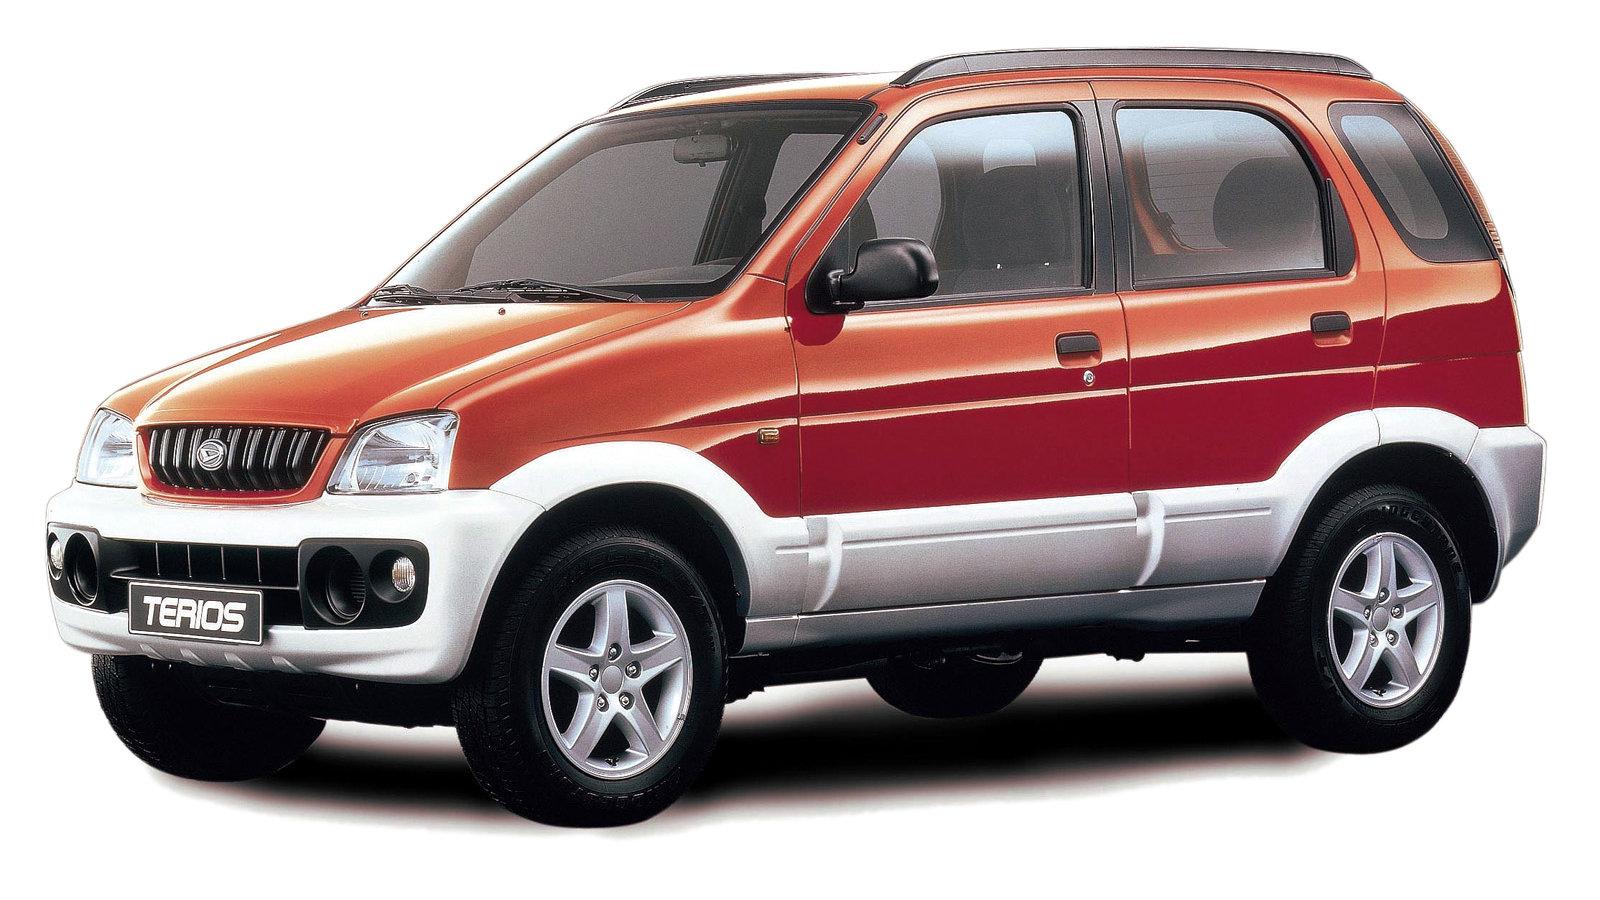 Daihatsu Terios S